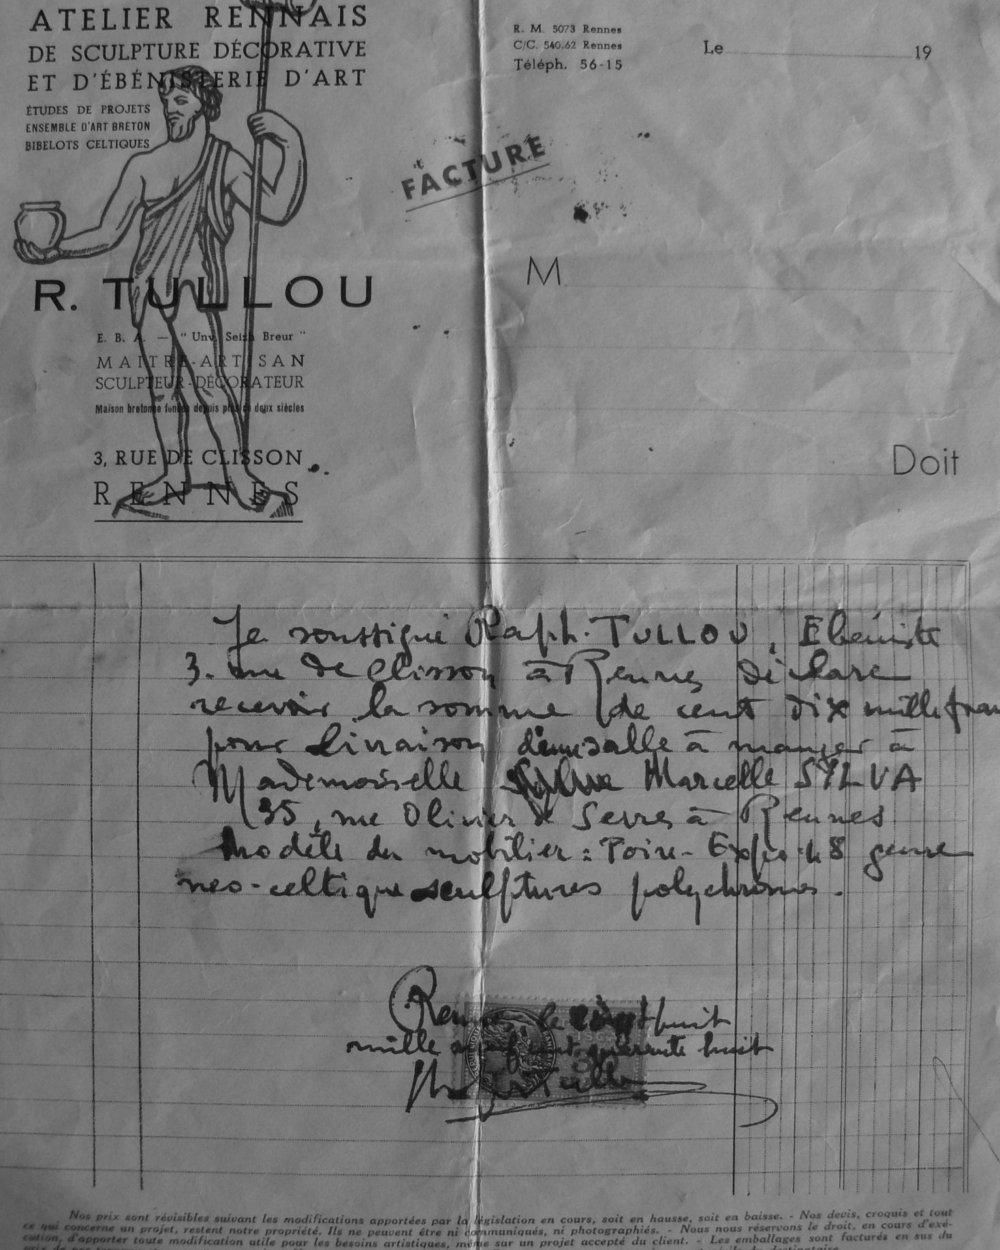 Tullou Facture 1948 Web Greyscale